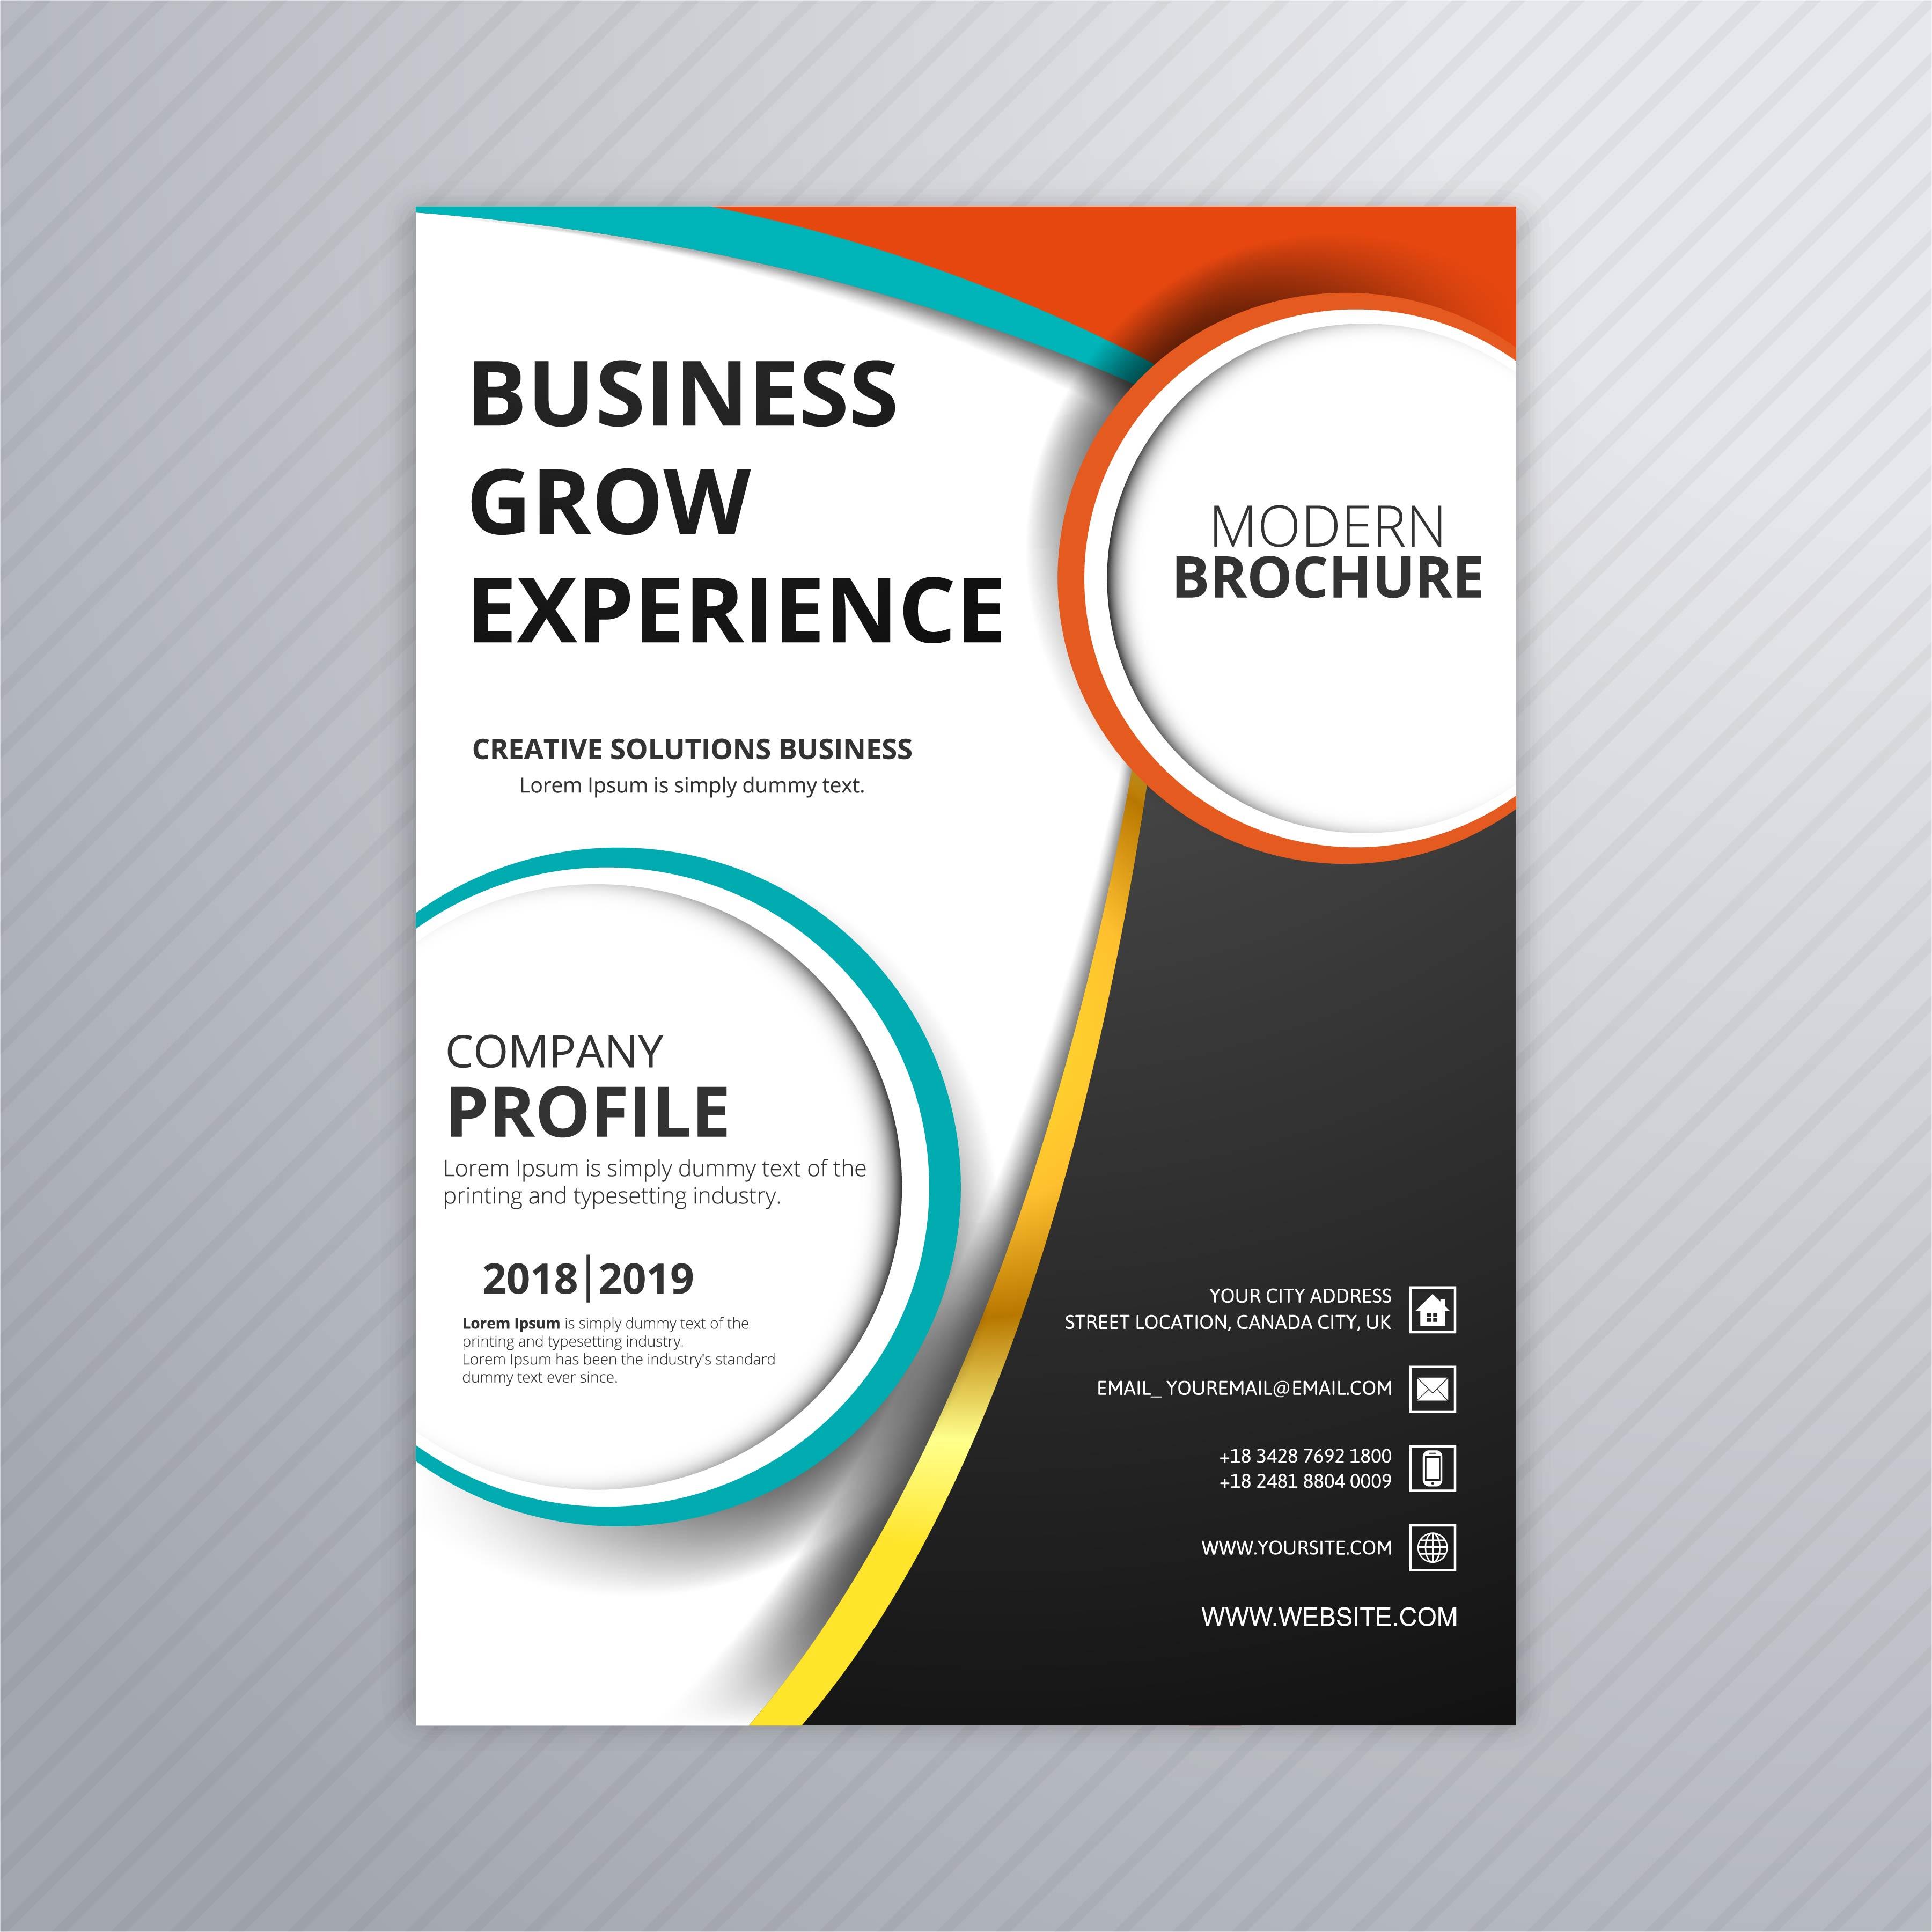 Graphic Design Brochures: Elegant Business Flyer Template Brochure Design